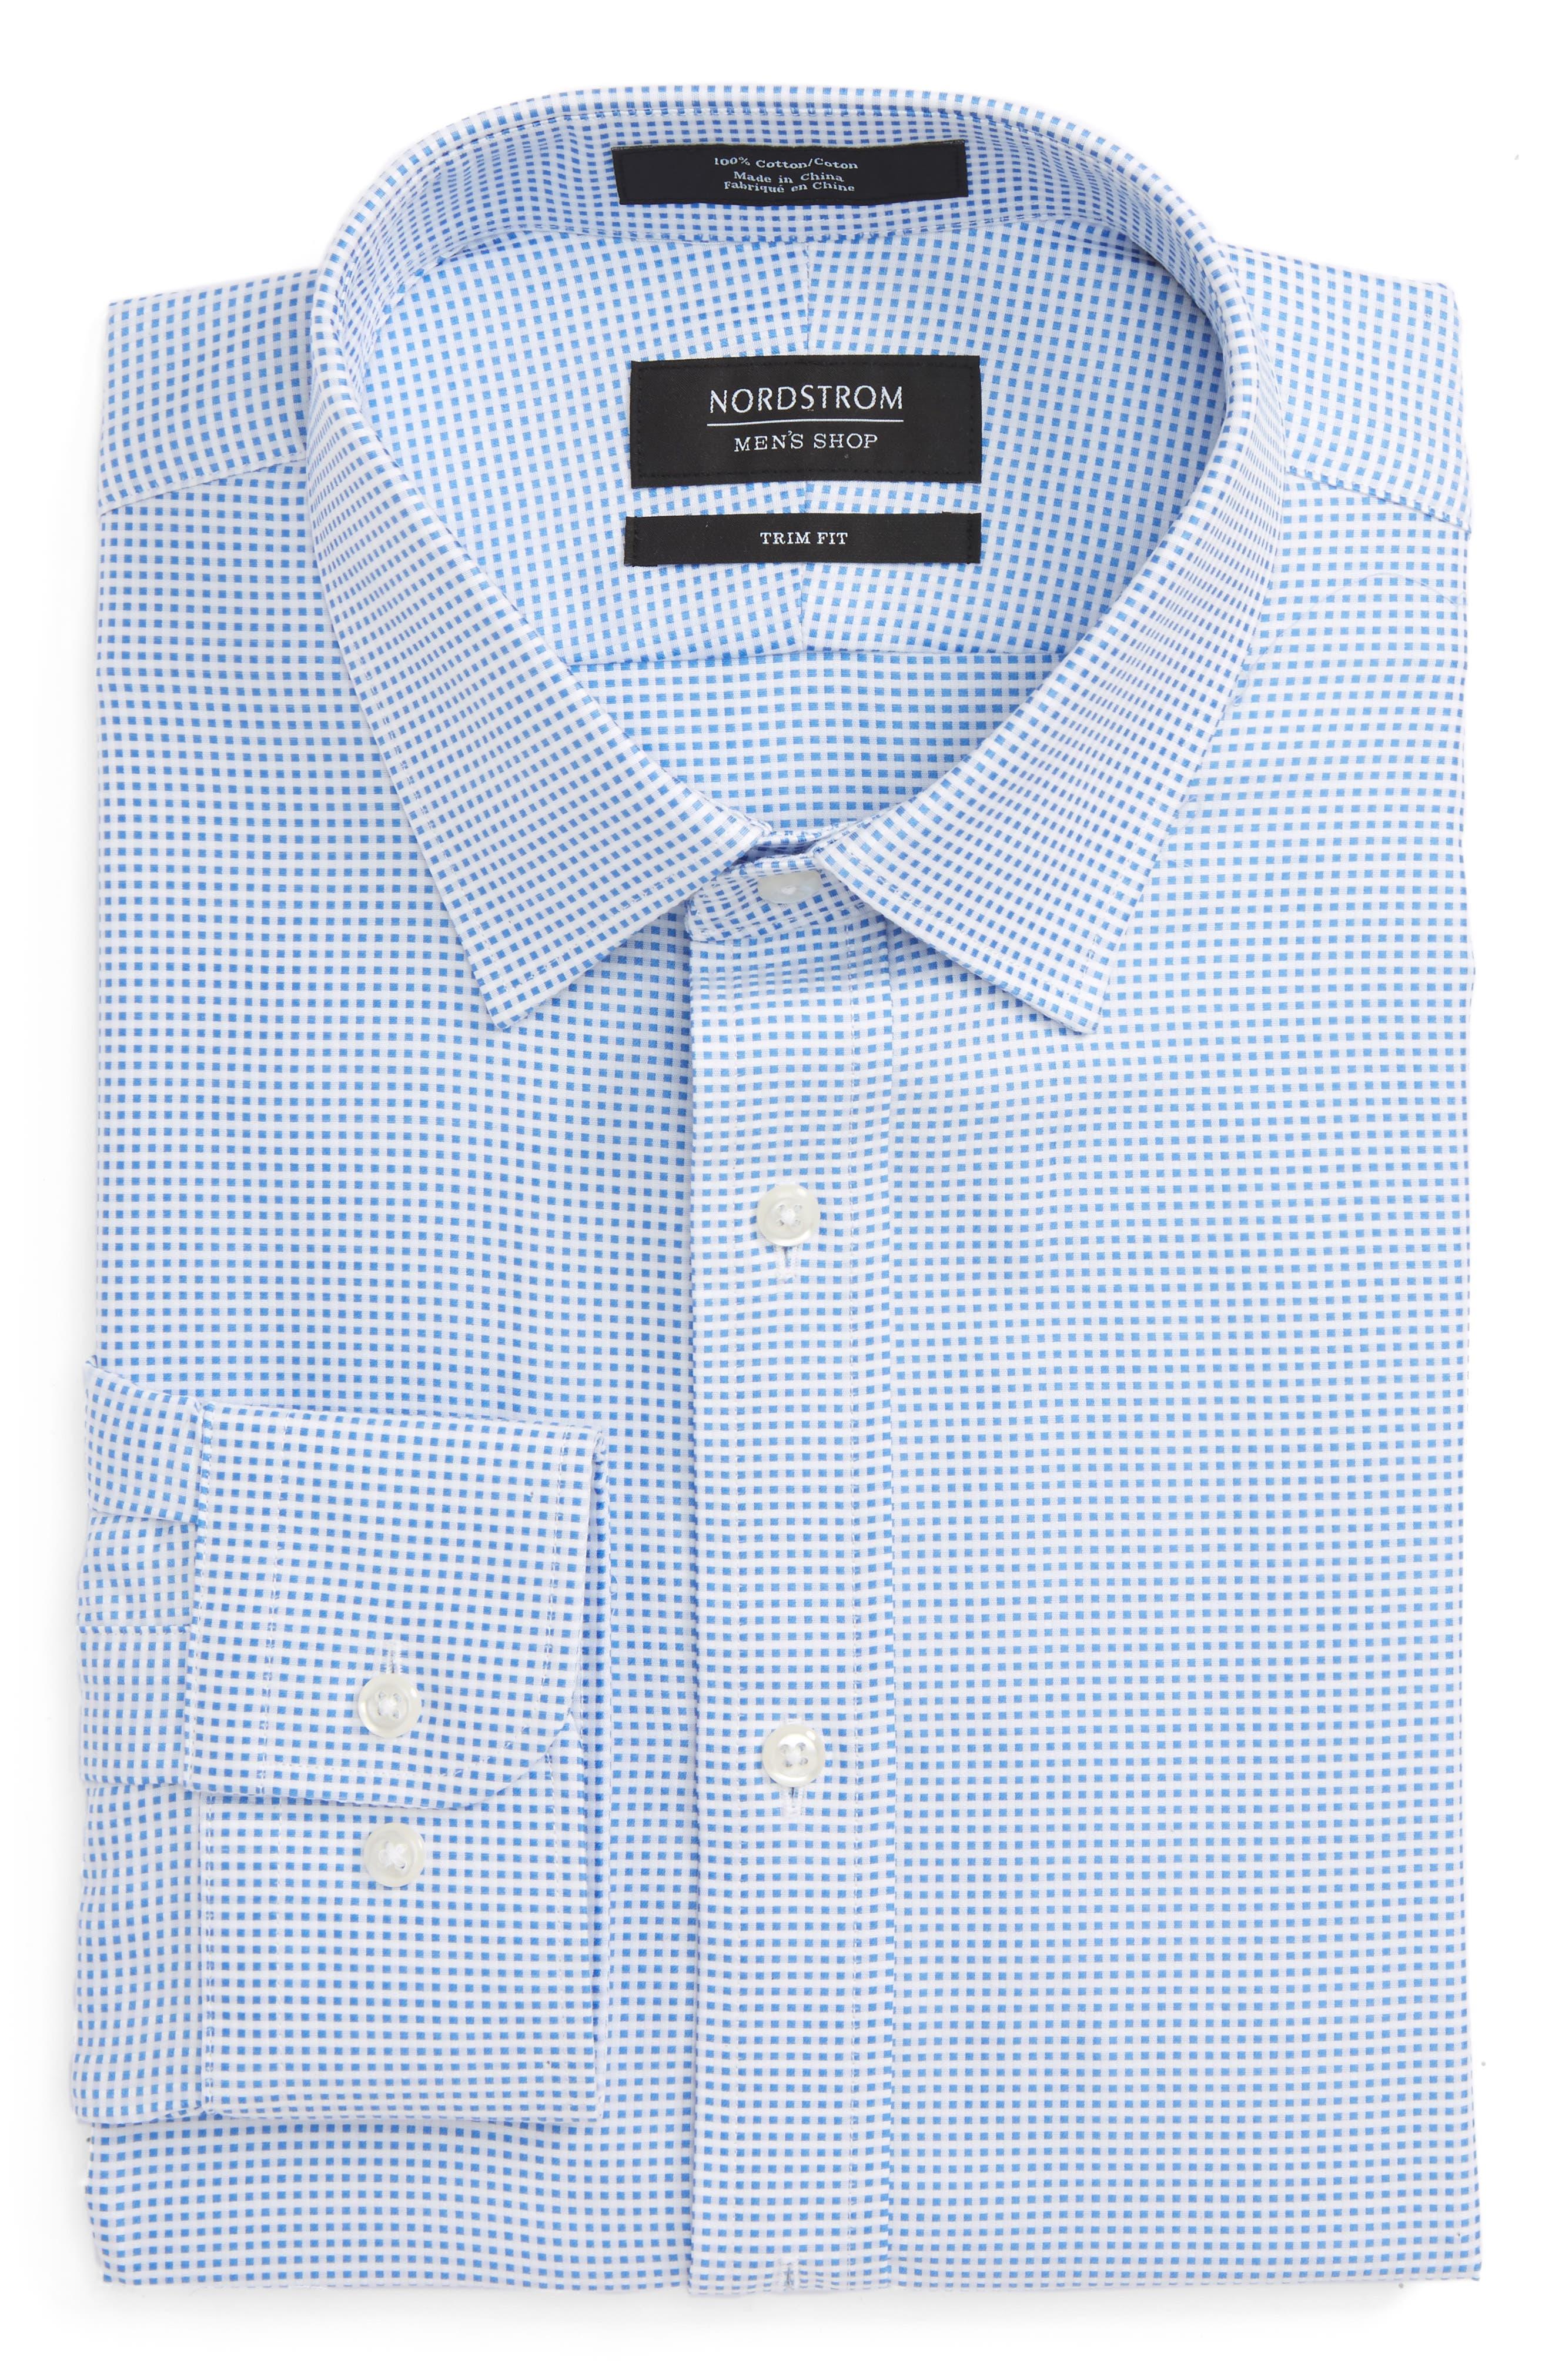 Main Image - Nordstrom Men's Shop Trim Fit Check Dress Shirt